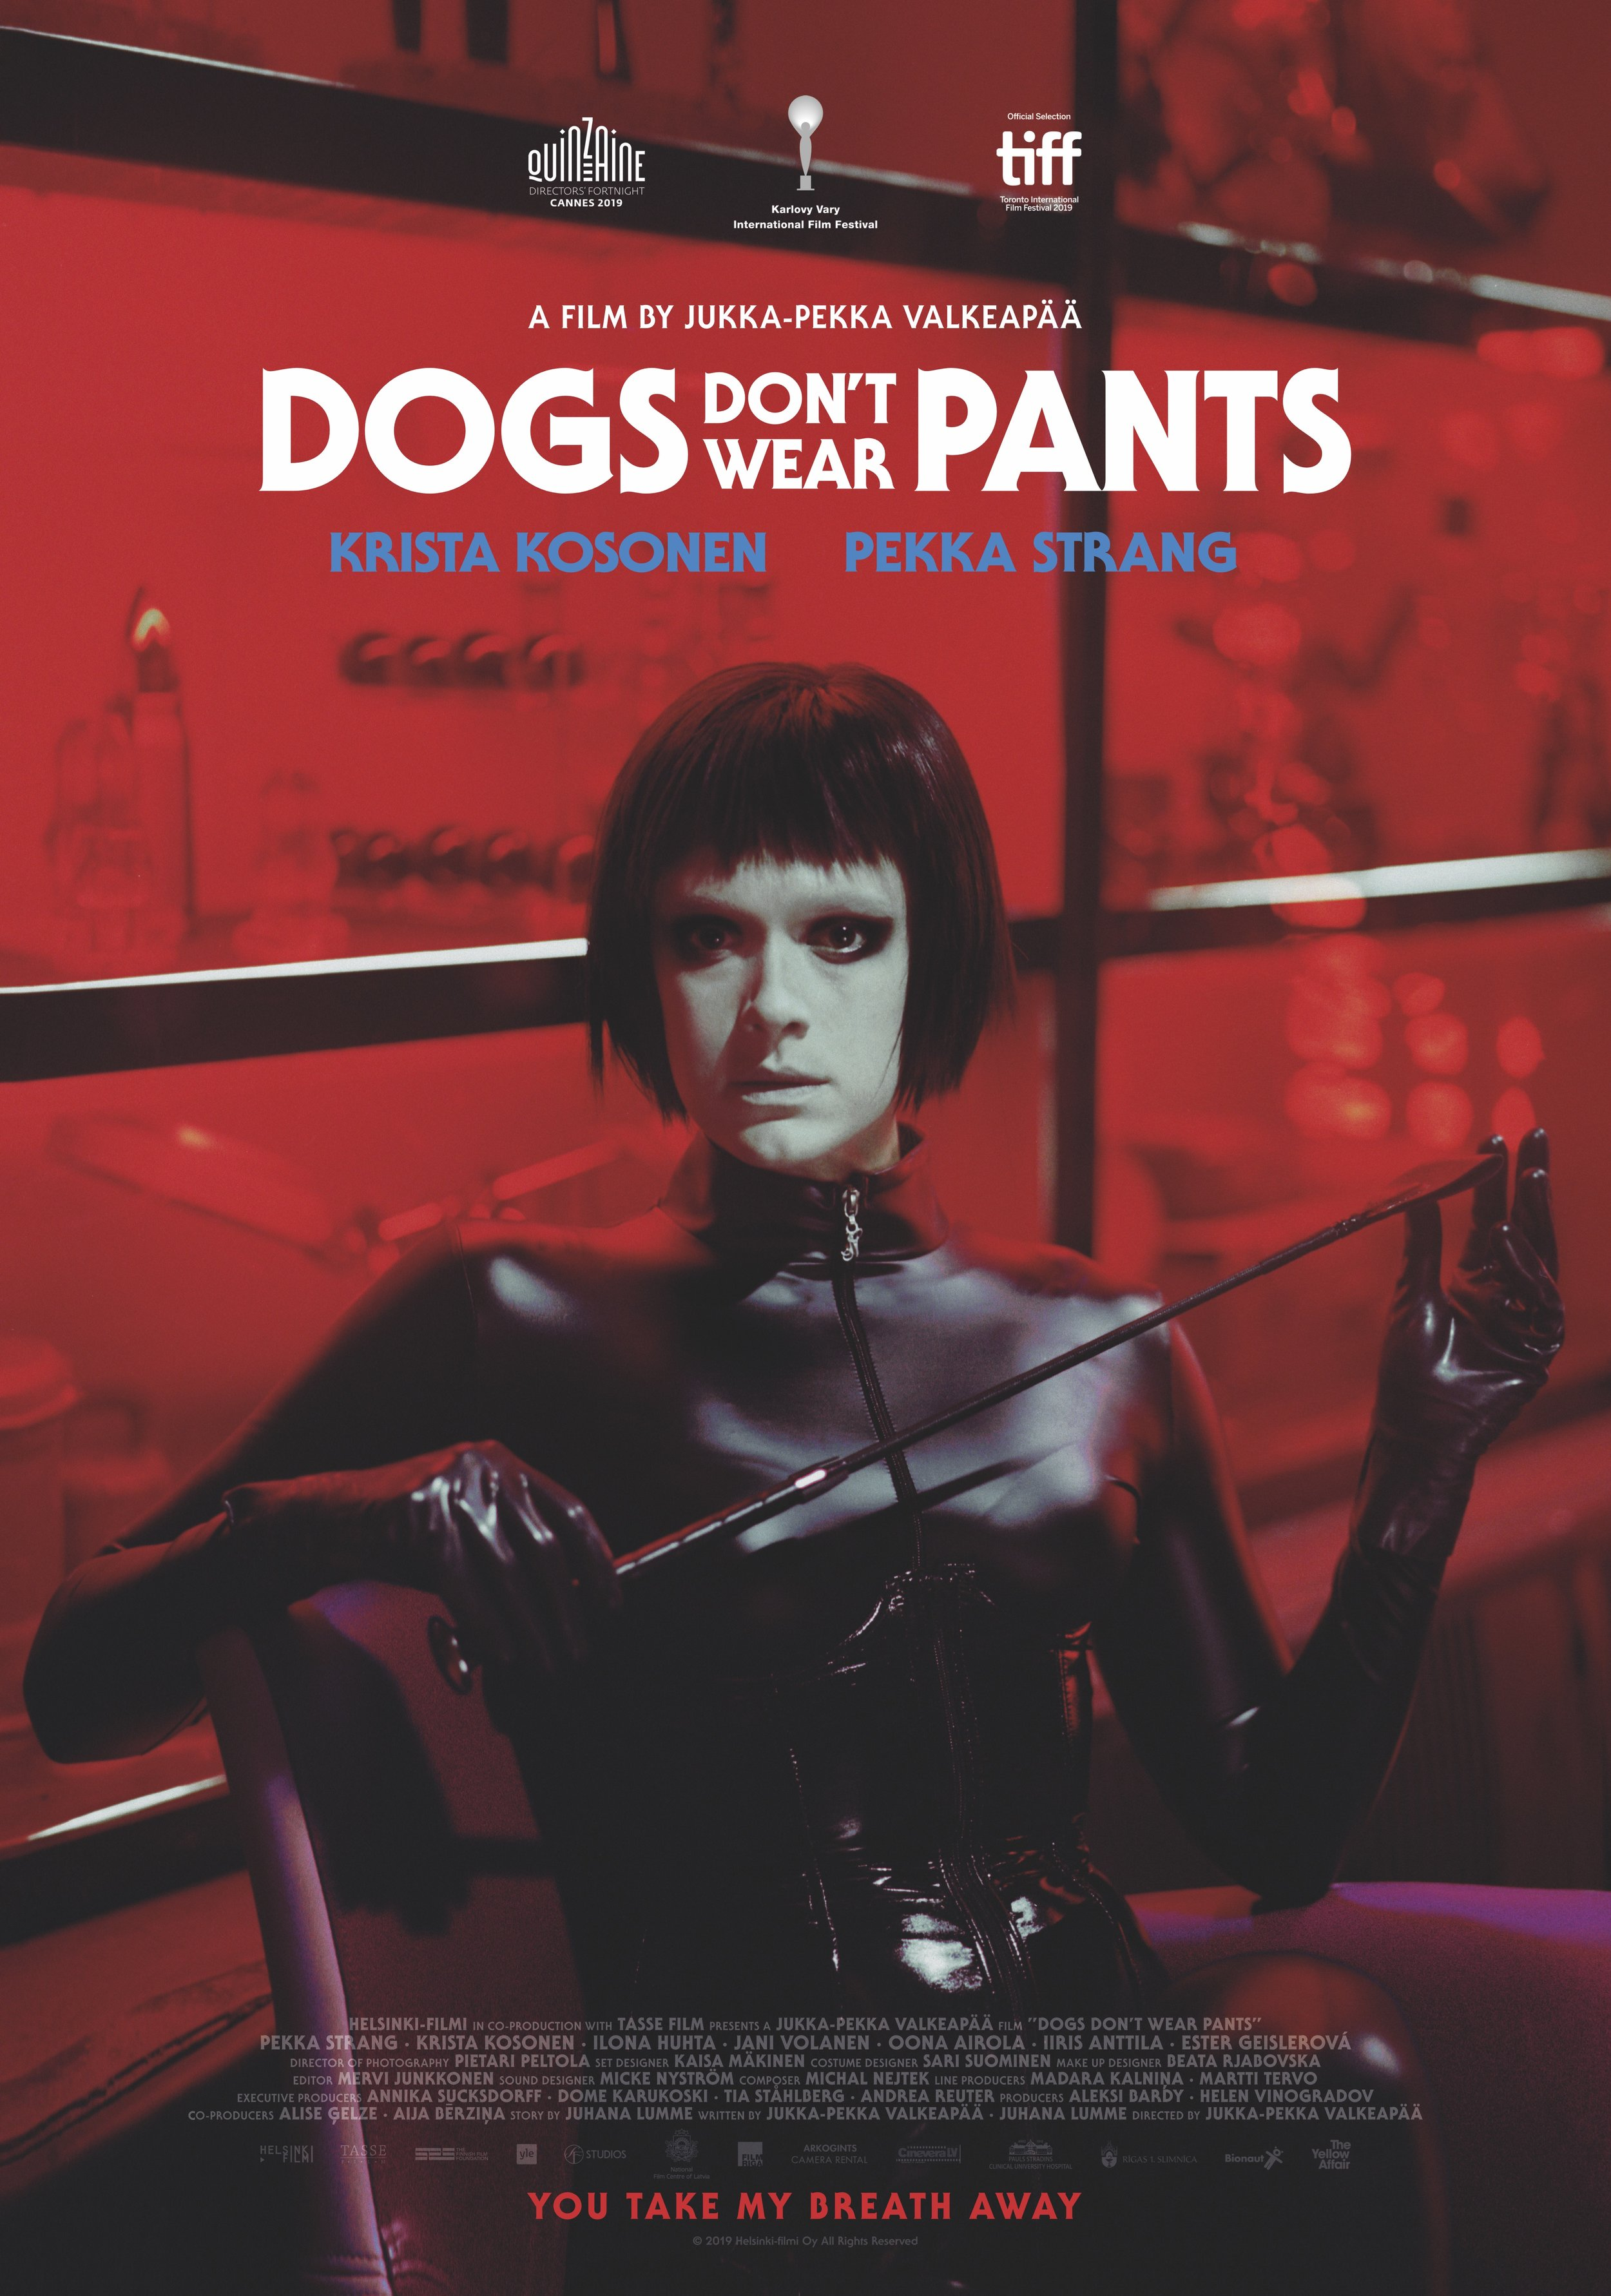 Dogs Poster - New.jpg